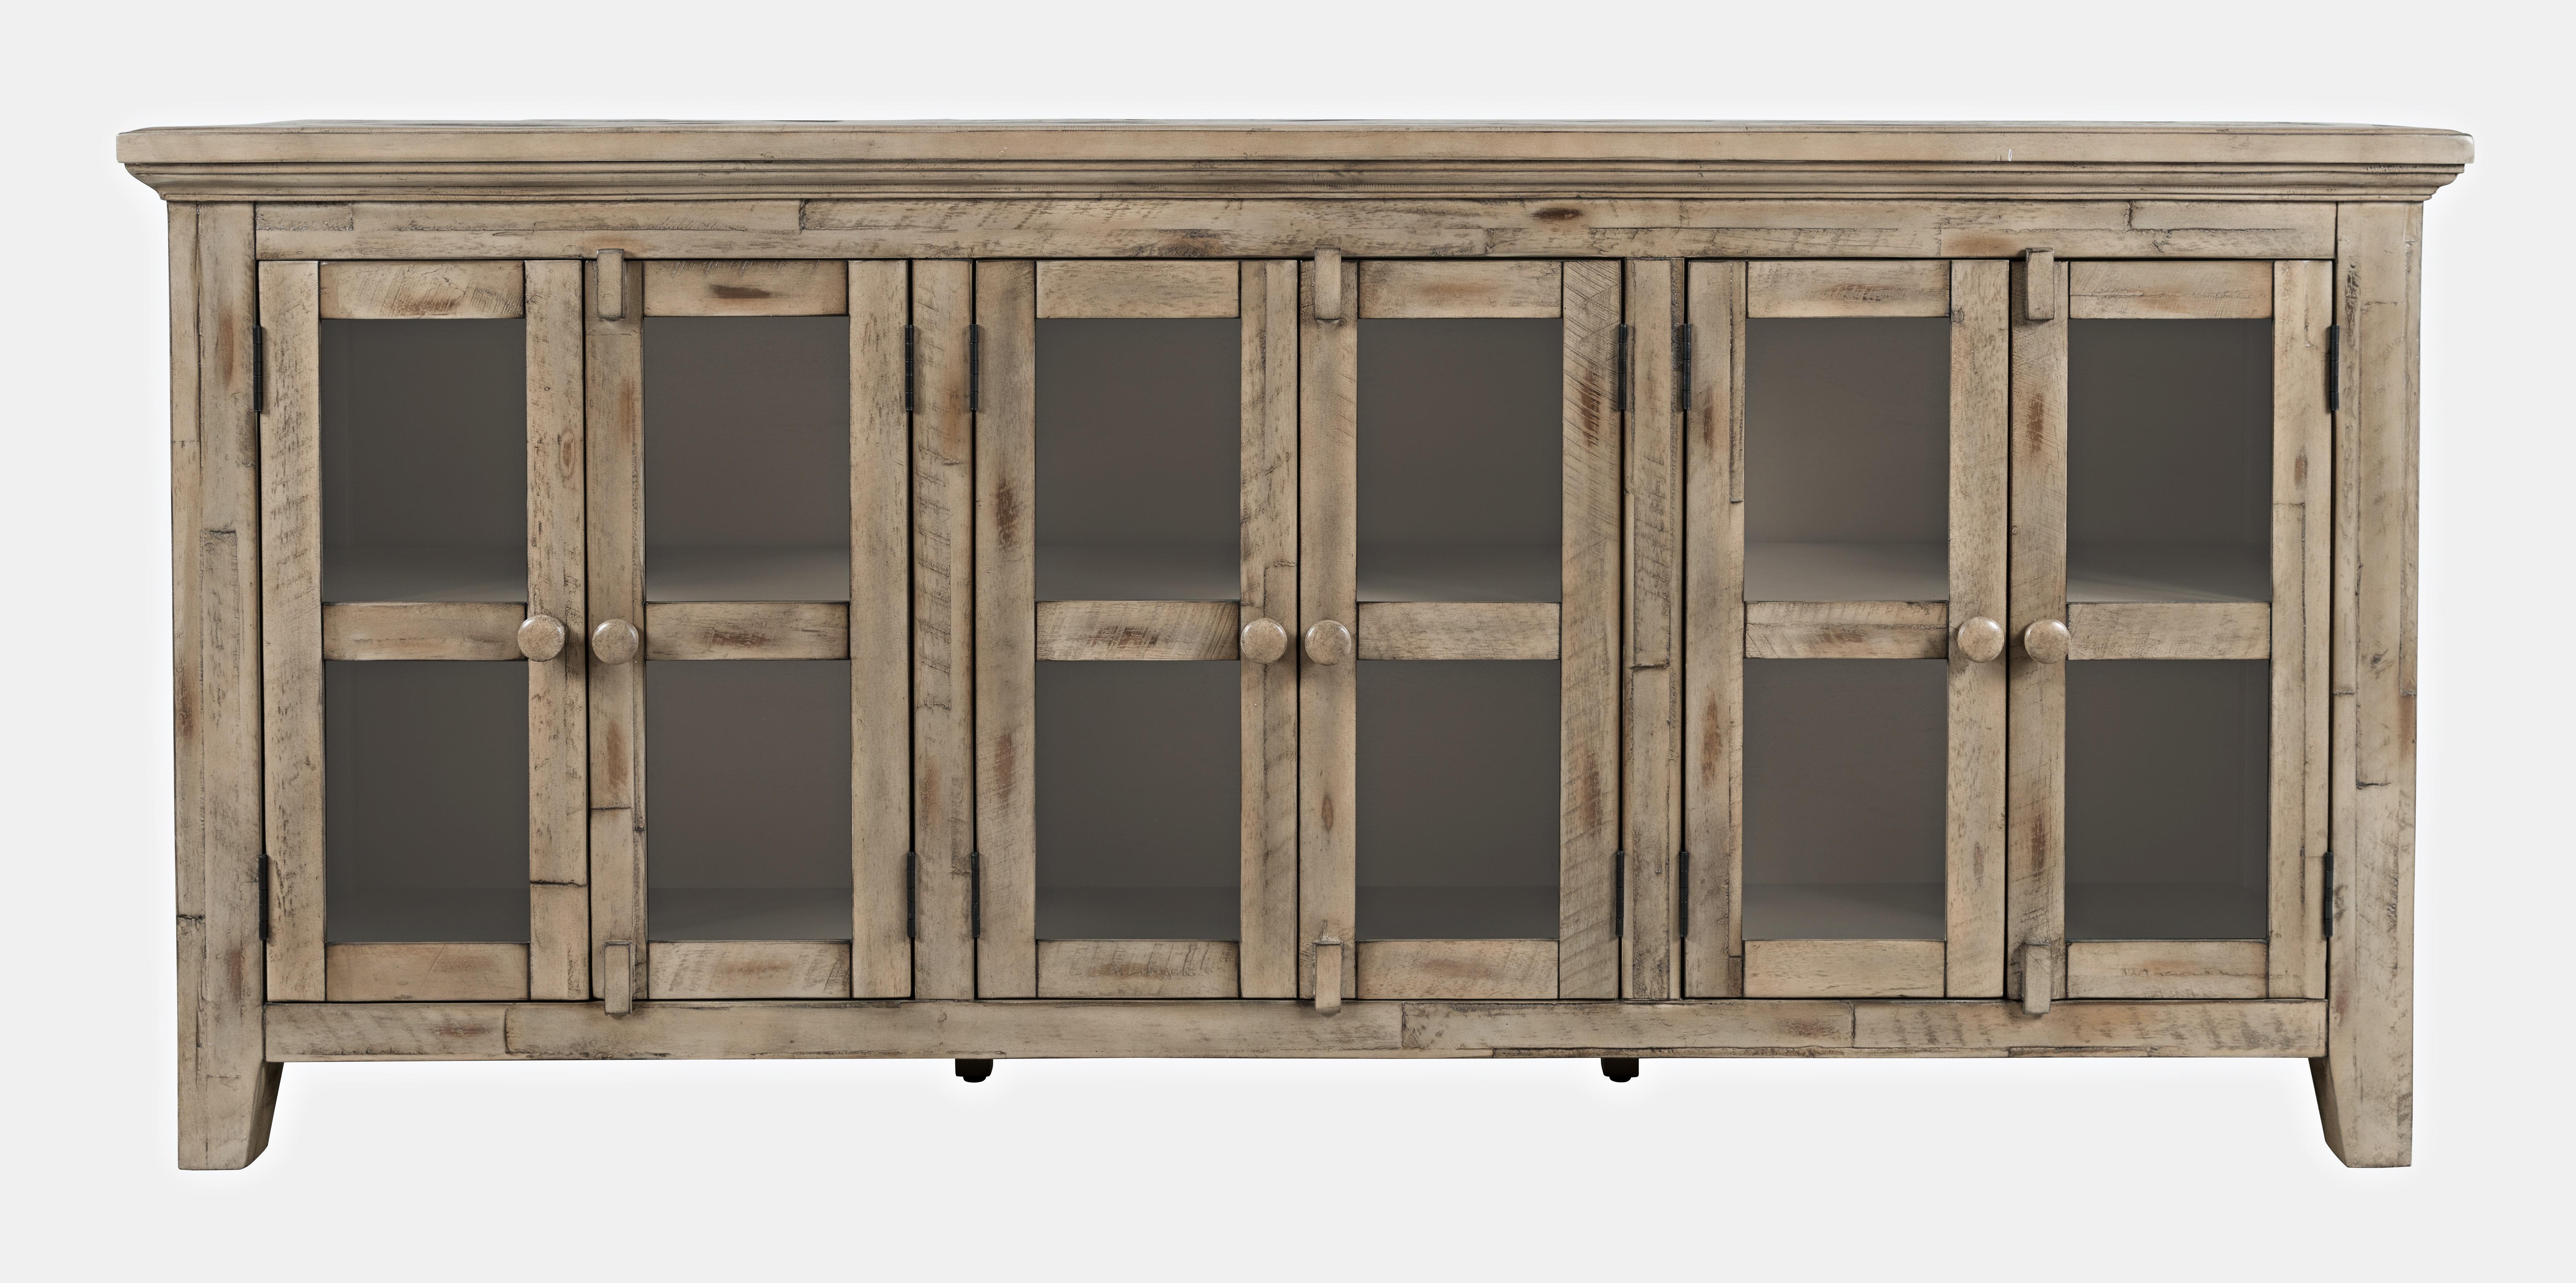 Rustic Shores 6 Door Low Cabinet by VFM Signature at Virginia Furniture Market